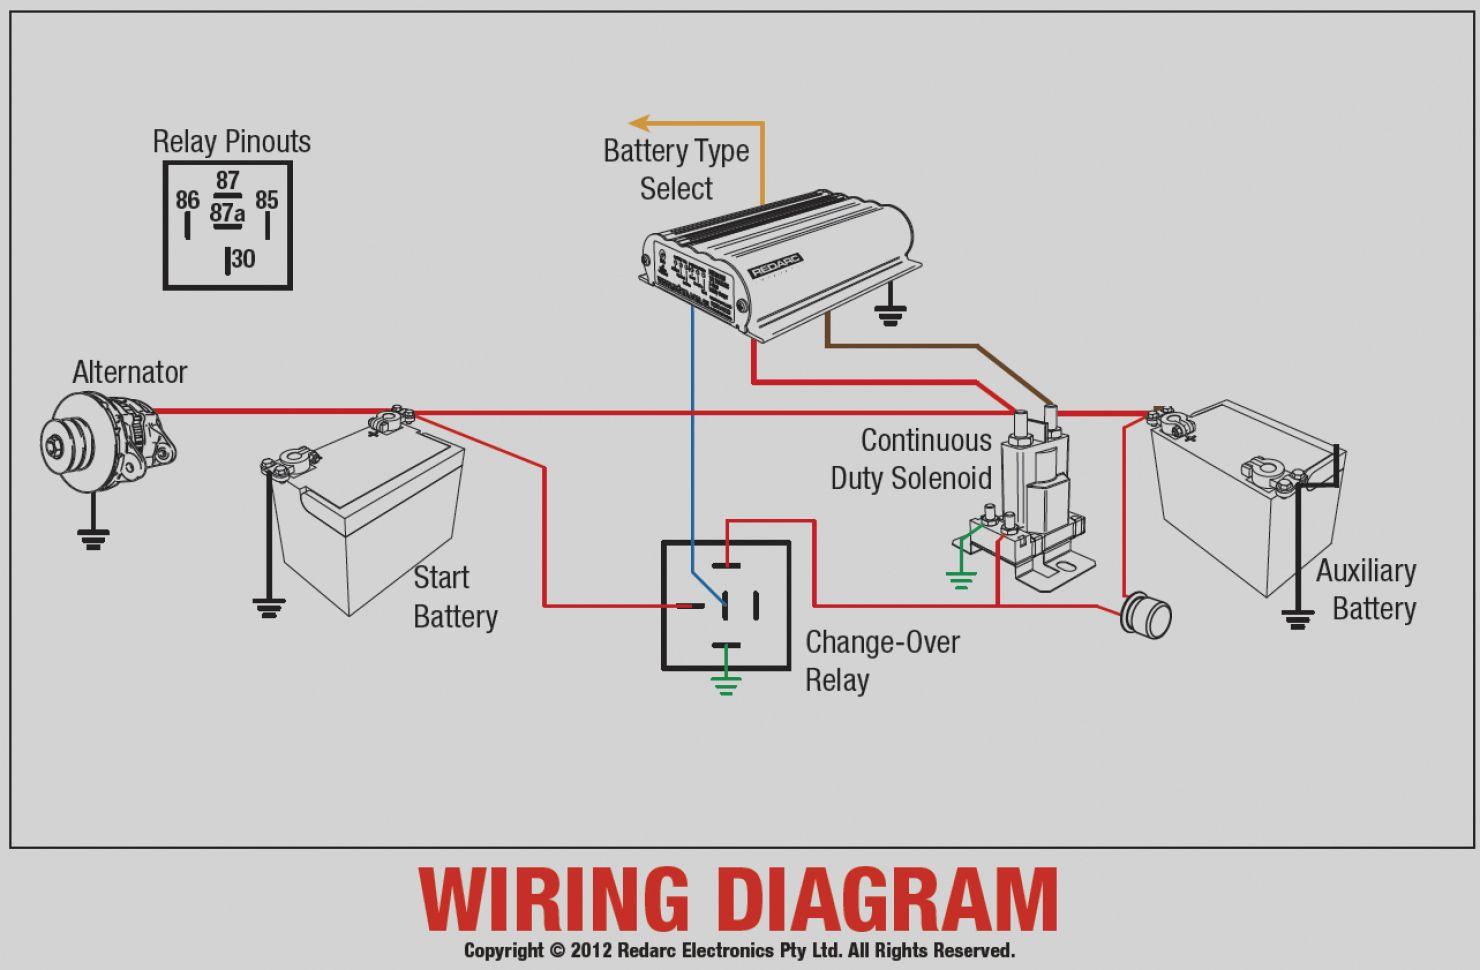 Hymer Caravan Wiring Diagram | Wiring Library - Battery Isolator Wiring Diagram